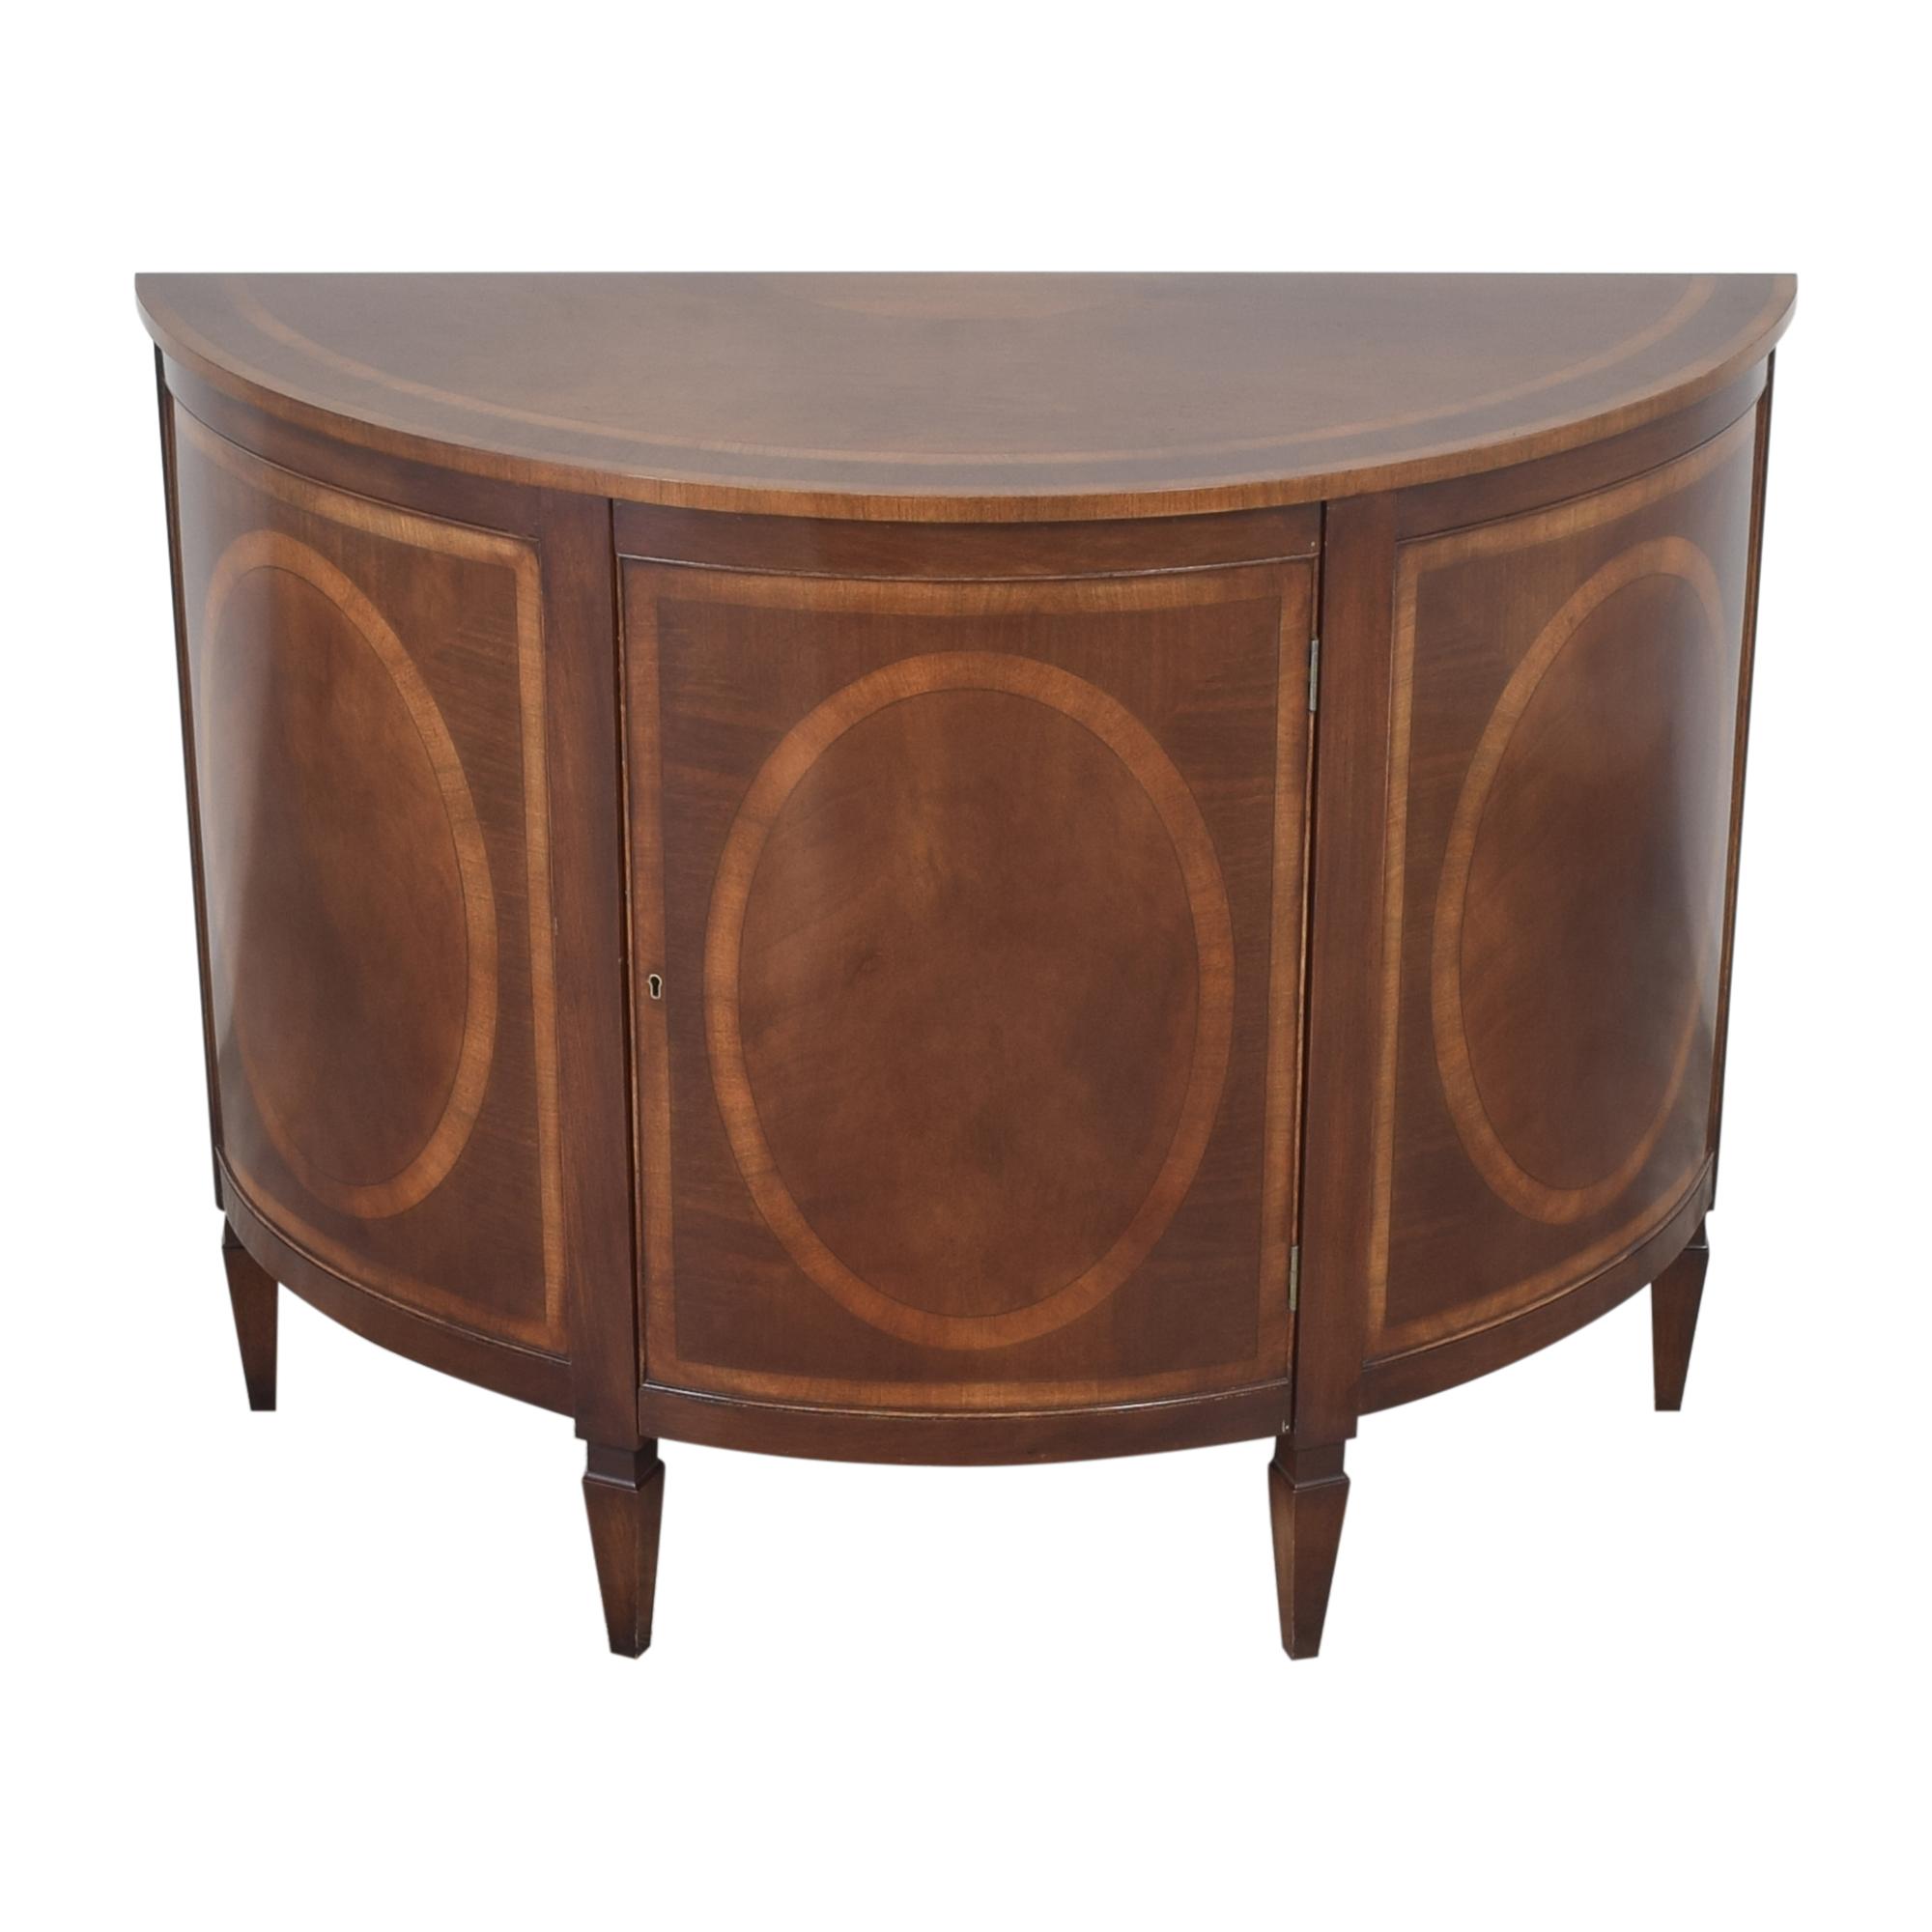 Trosby Furniture Trosby Furniture Demilune Console on sale